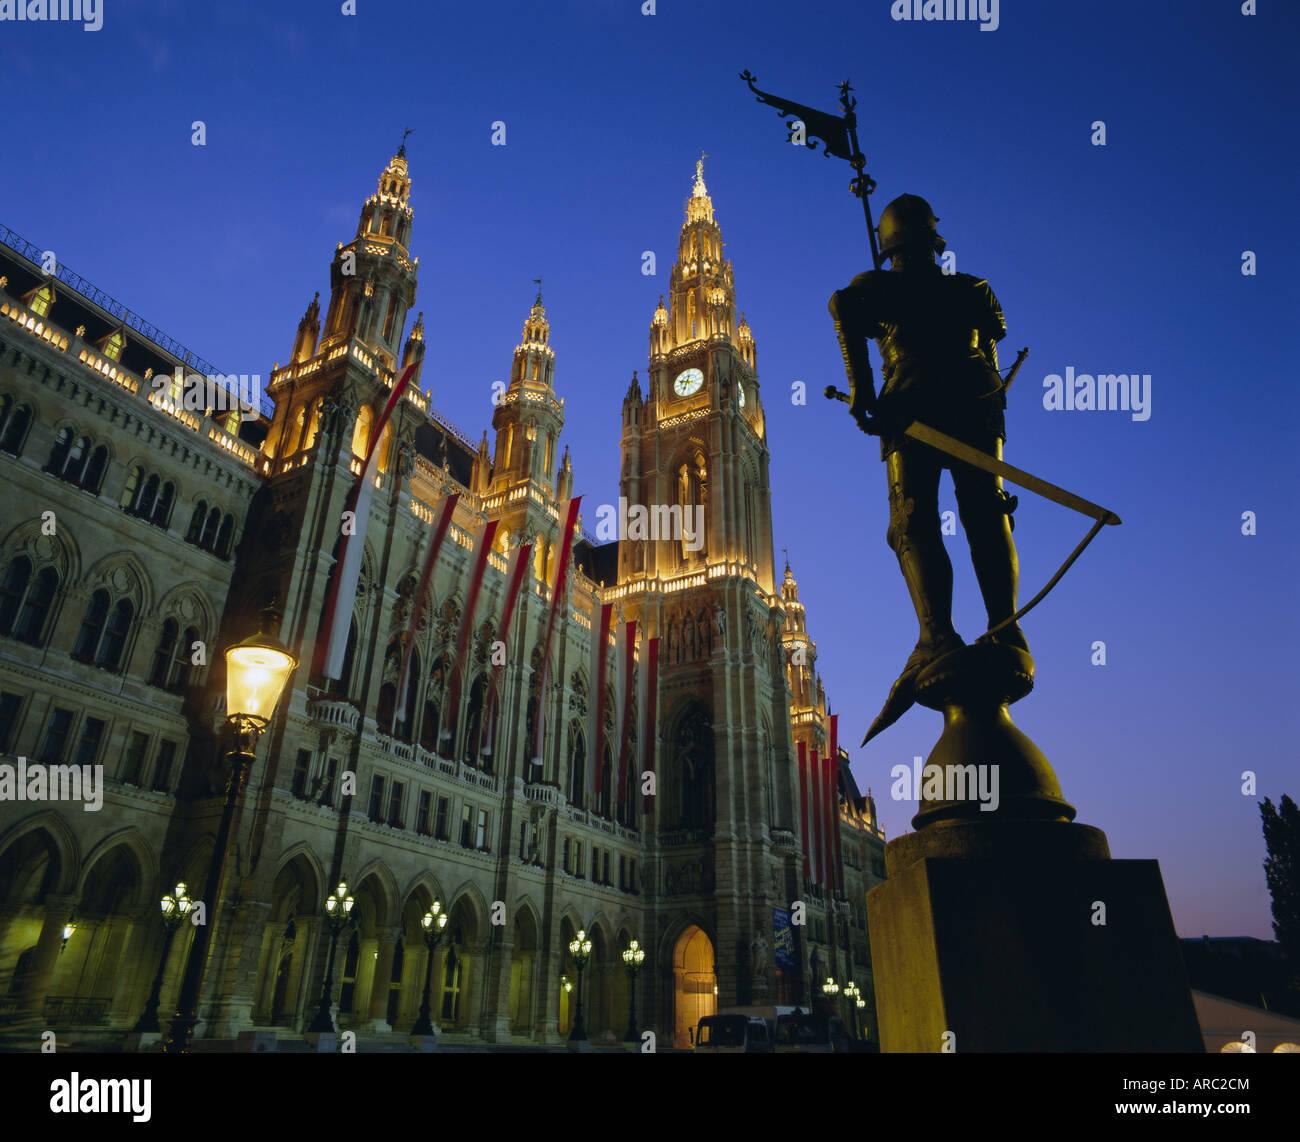 Rathaus (Town Hall), Vienna, Austria, Europe - Stock Image